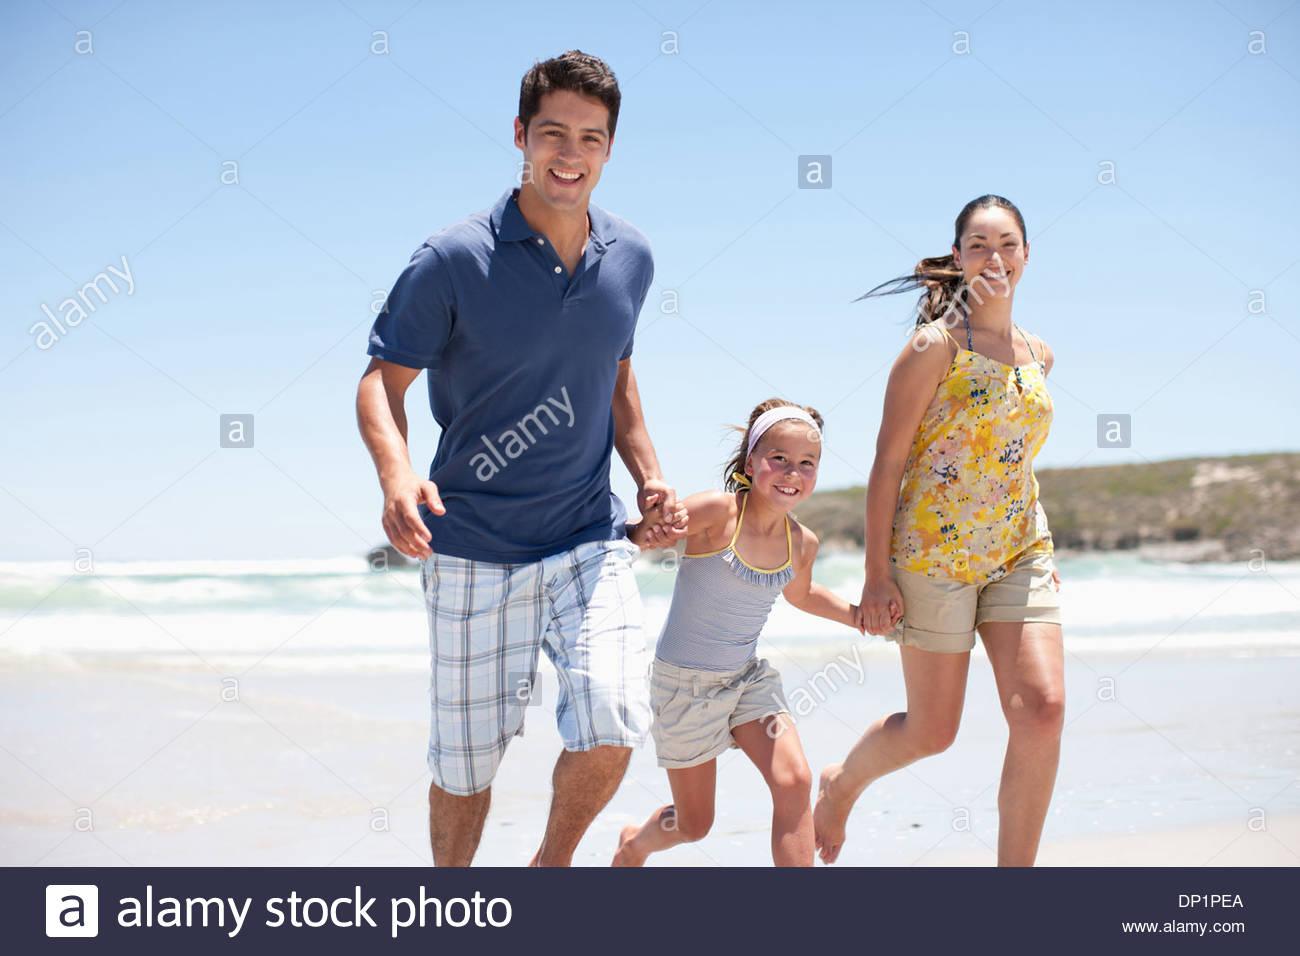 Family running on beach Stock Photo